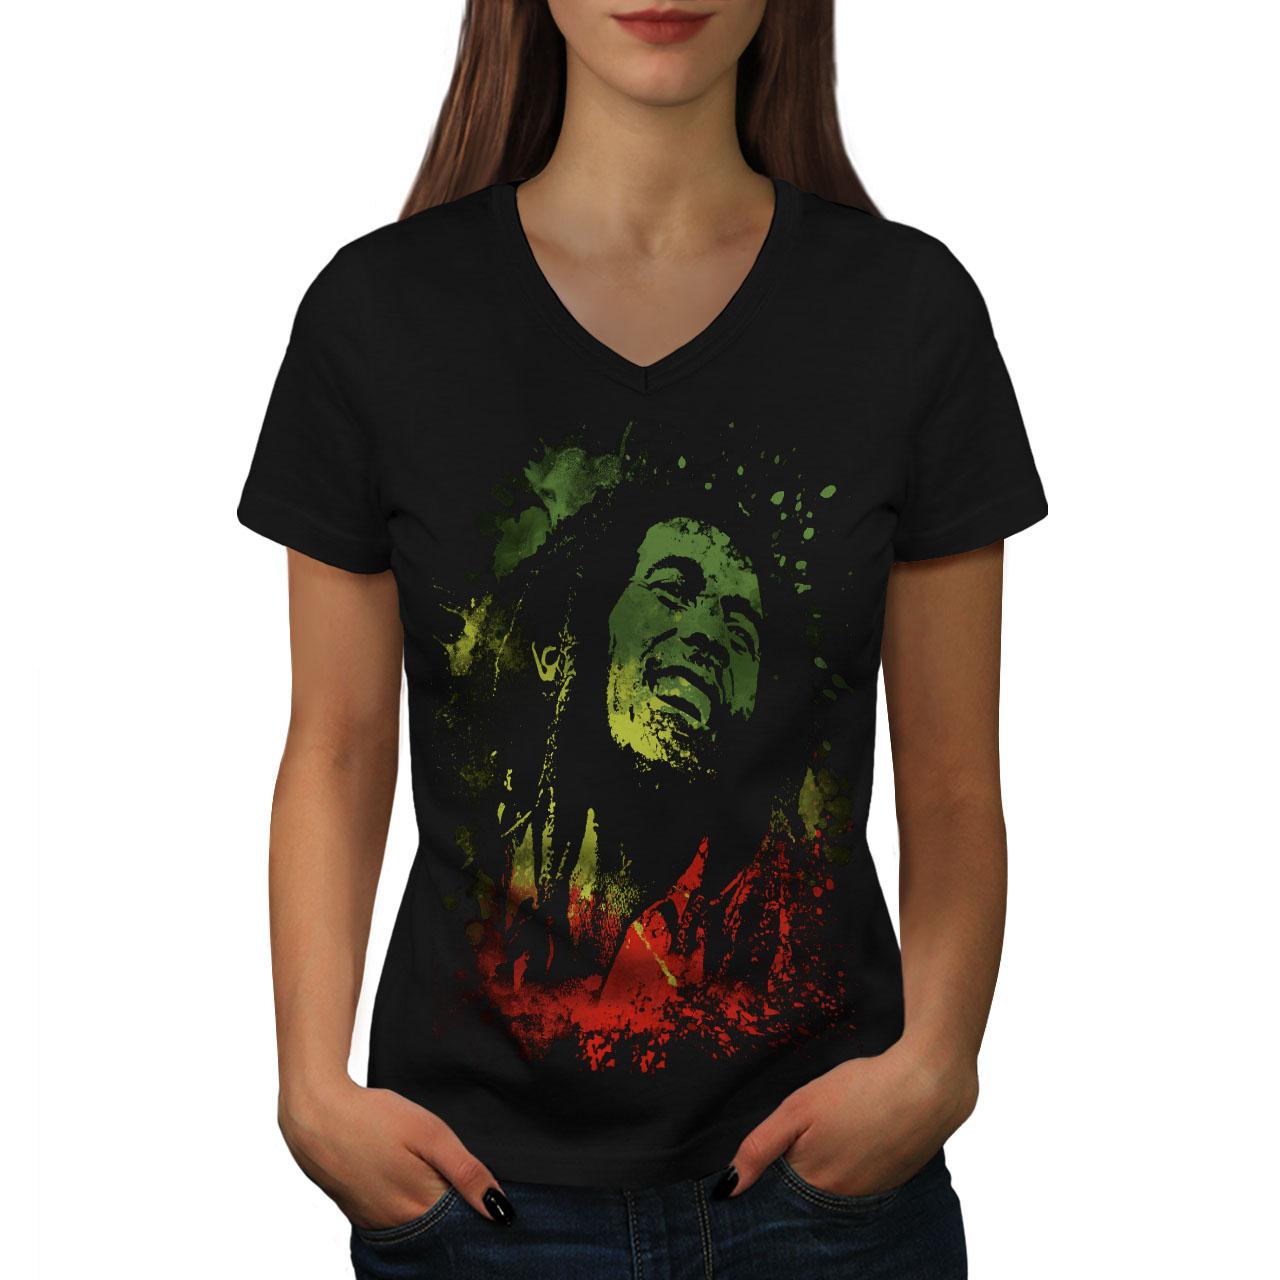 Importé De L'éTranger Wellcoda Légende Bob Rasta Marley Femme T-shirt Col V, Rasta Design Graphique Tee-afficher Le Titre D'origine